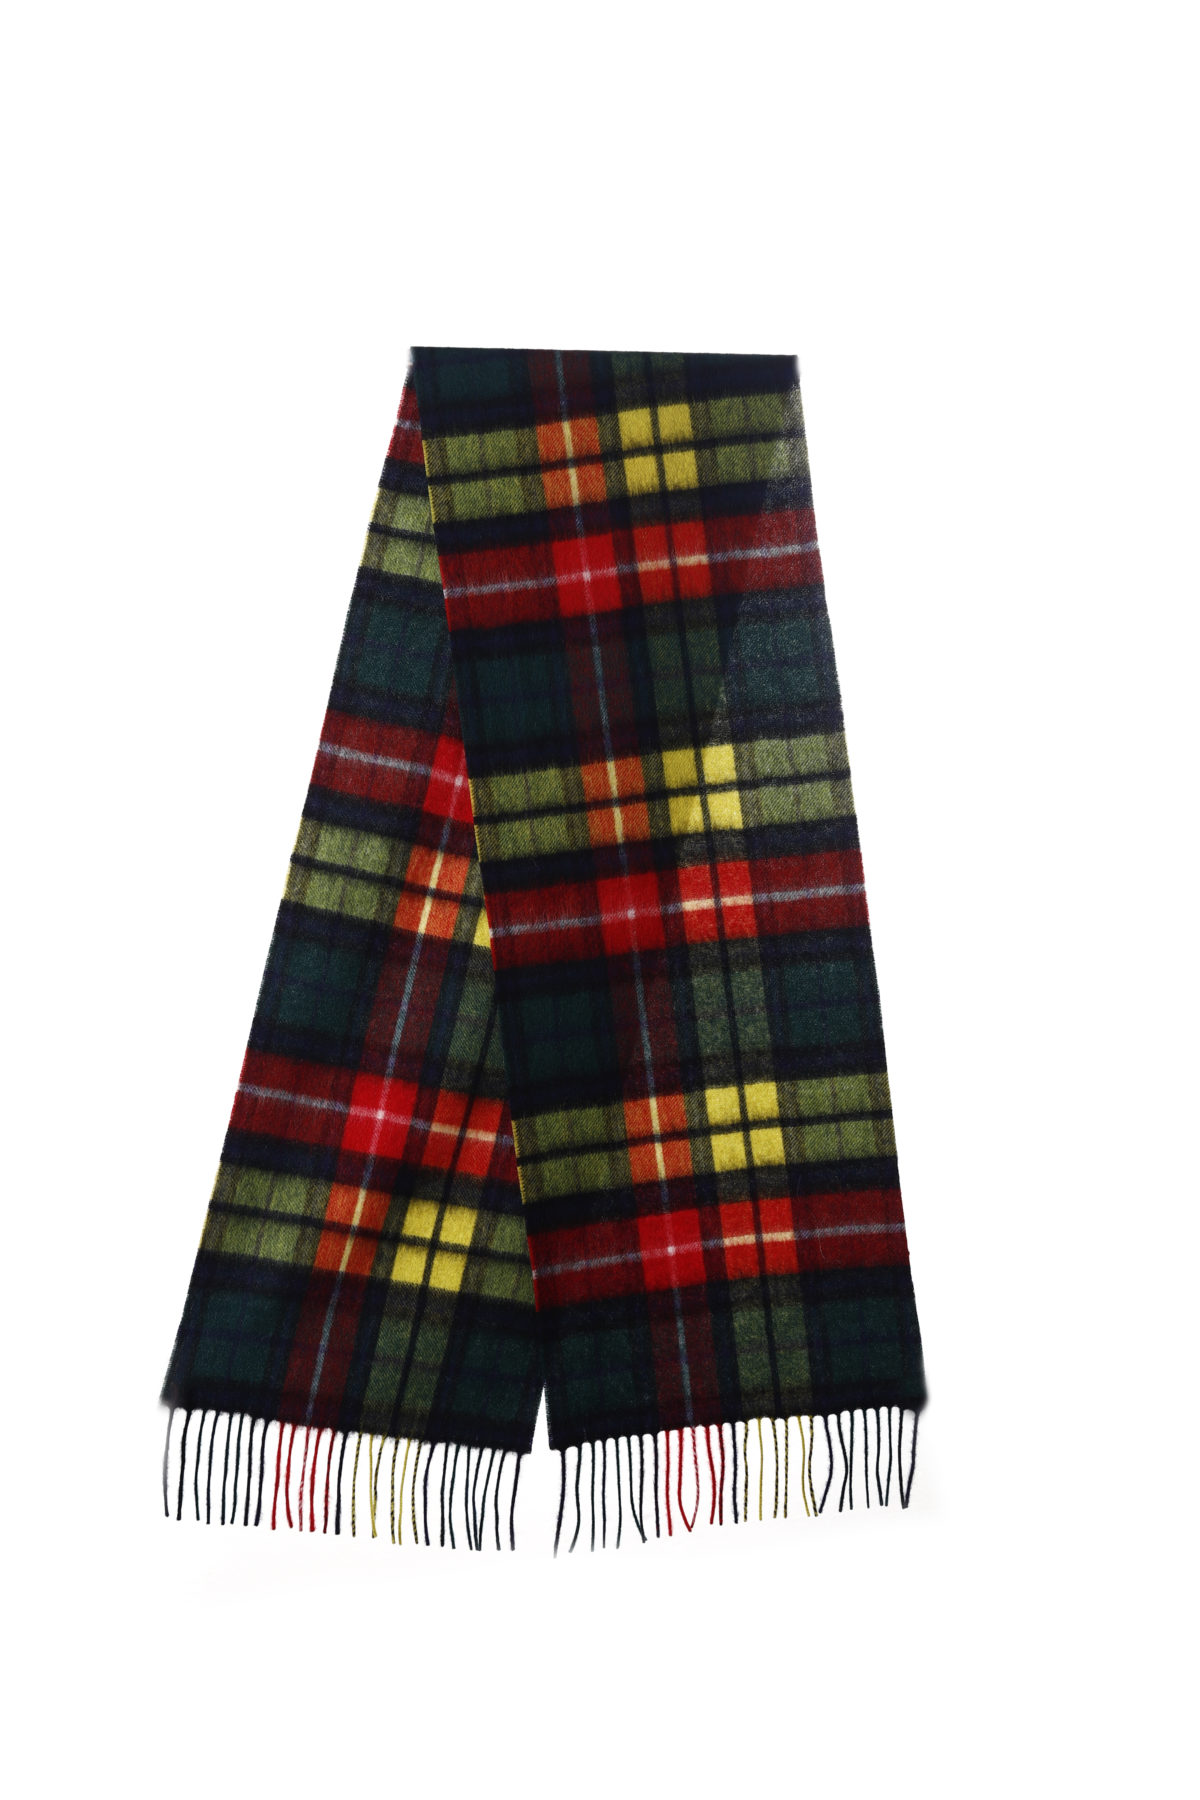 Edinburgh Lambswool Buchanan Tartan Lambswool Blanket